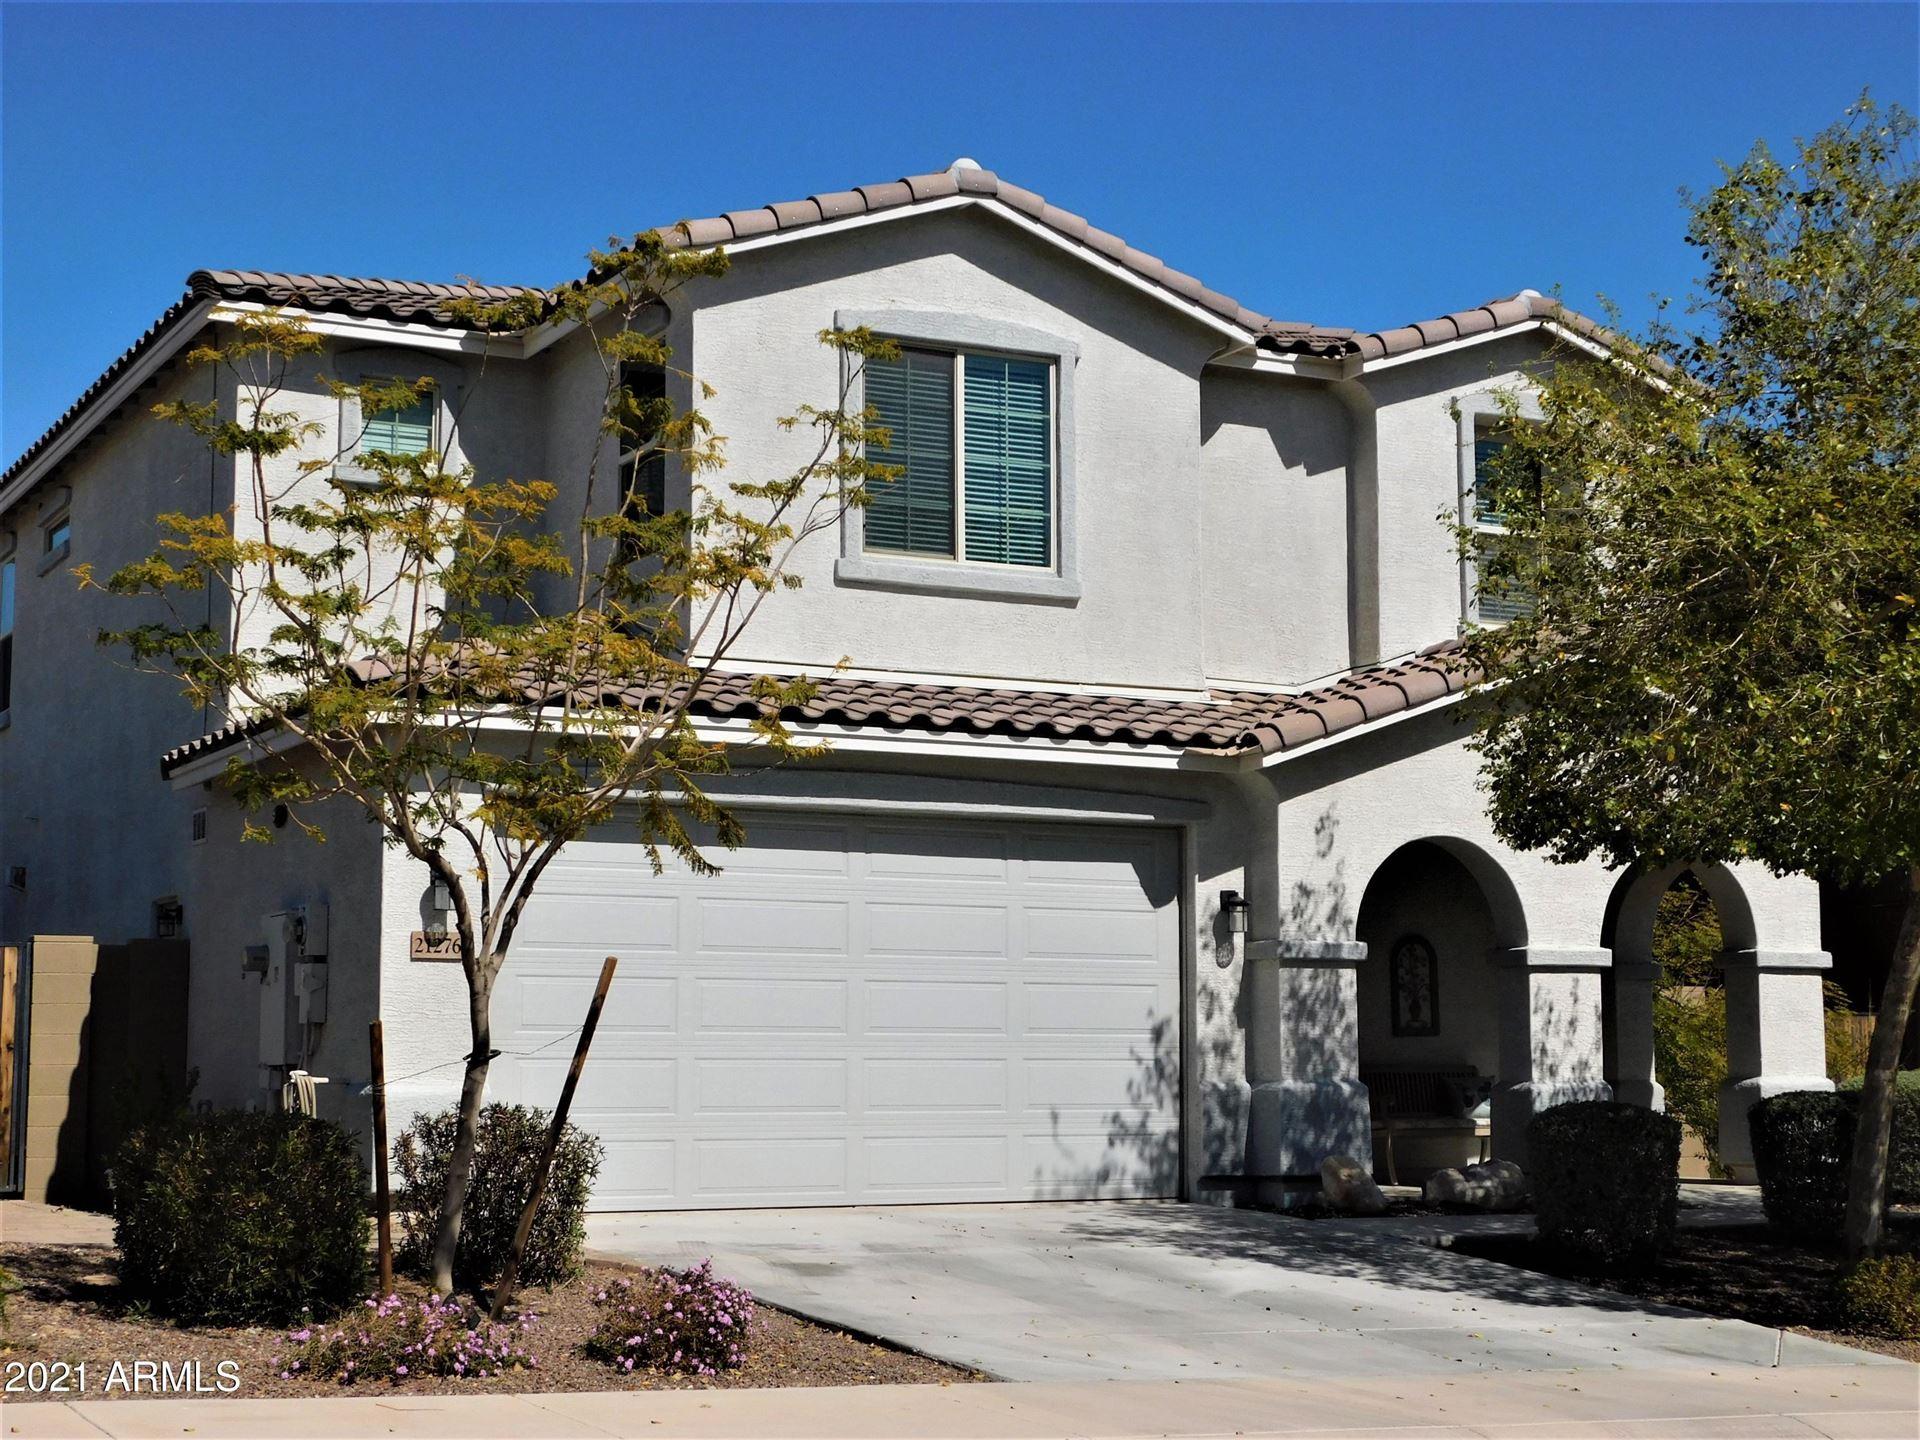 Photo of 21276 W BERKELEY Road, Buckeye, AZ 85396 (MLS # 6203463)